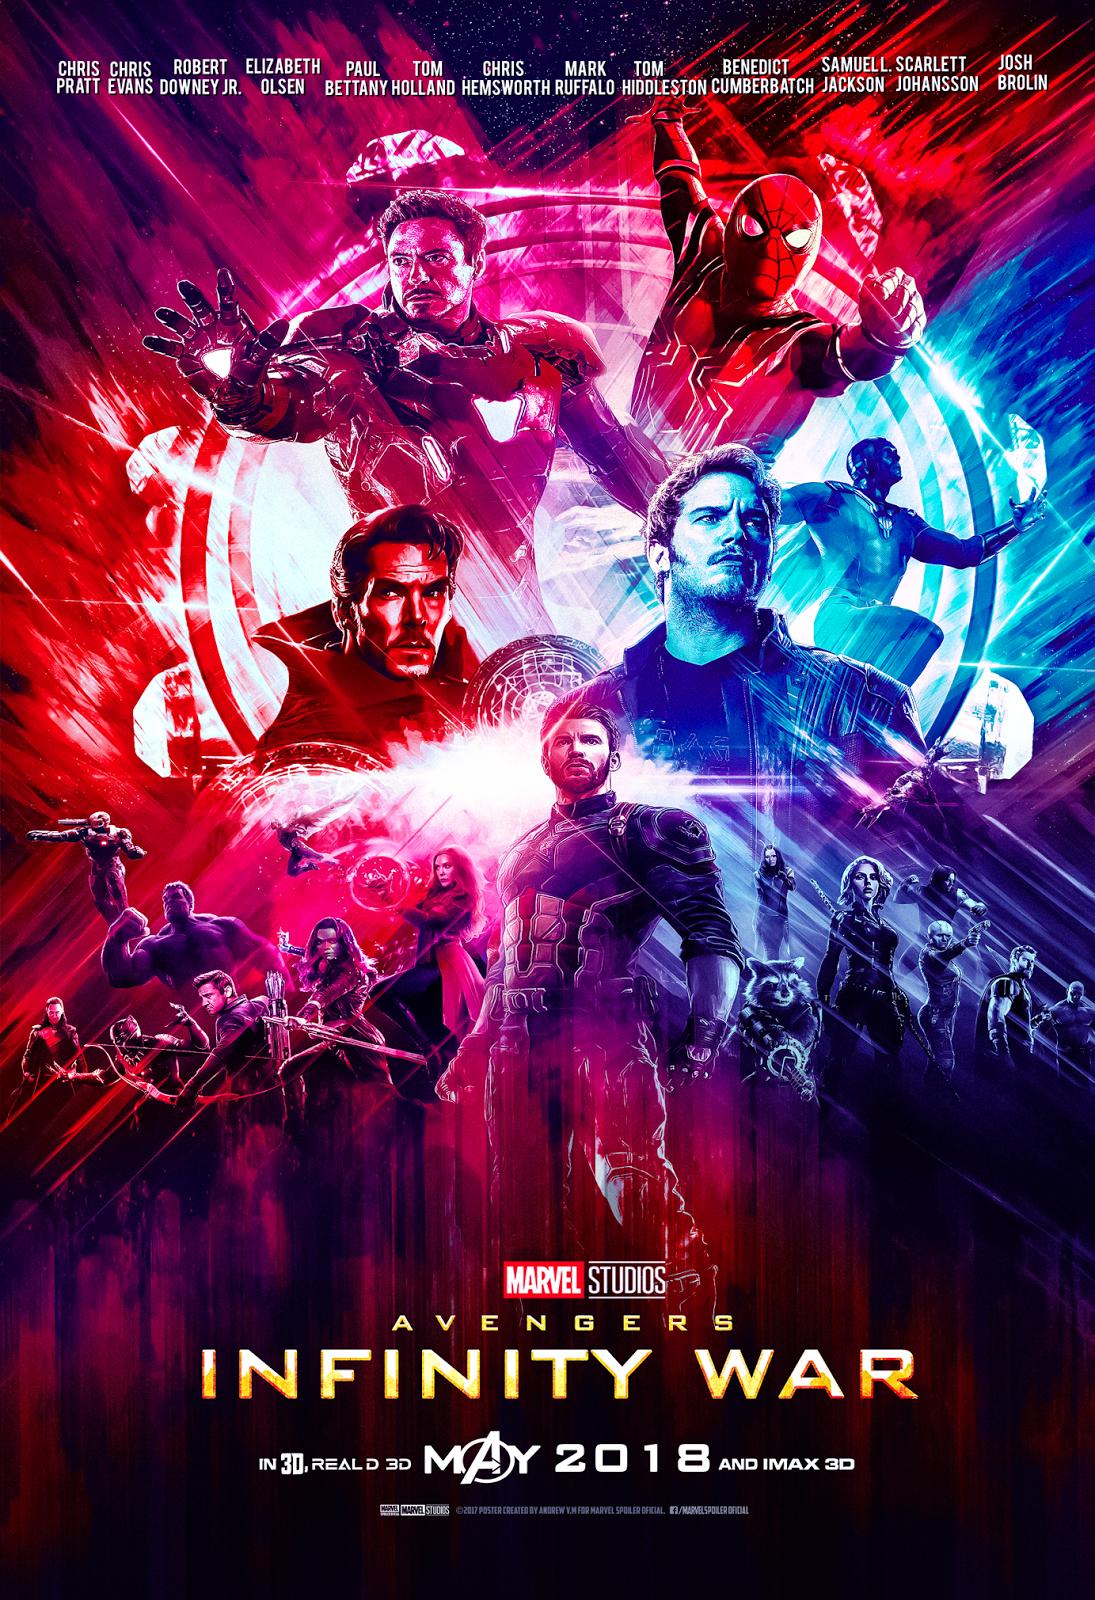 avengers infinity war iron man suit avengers infinity war